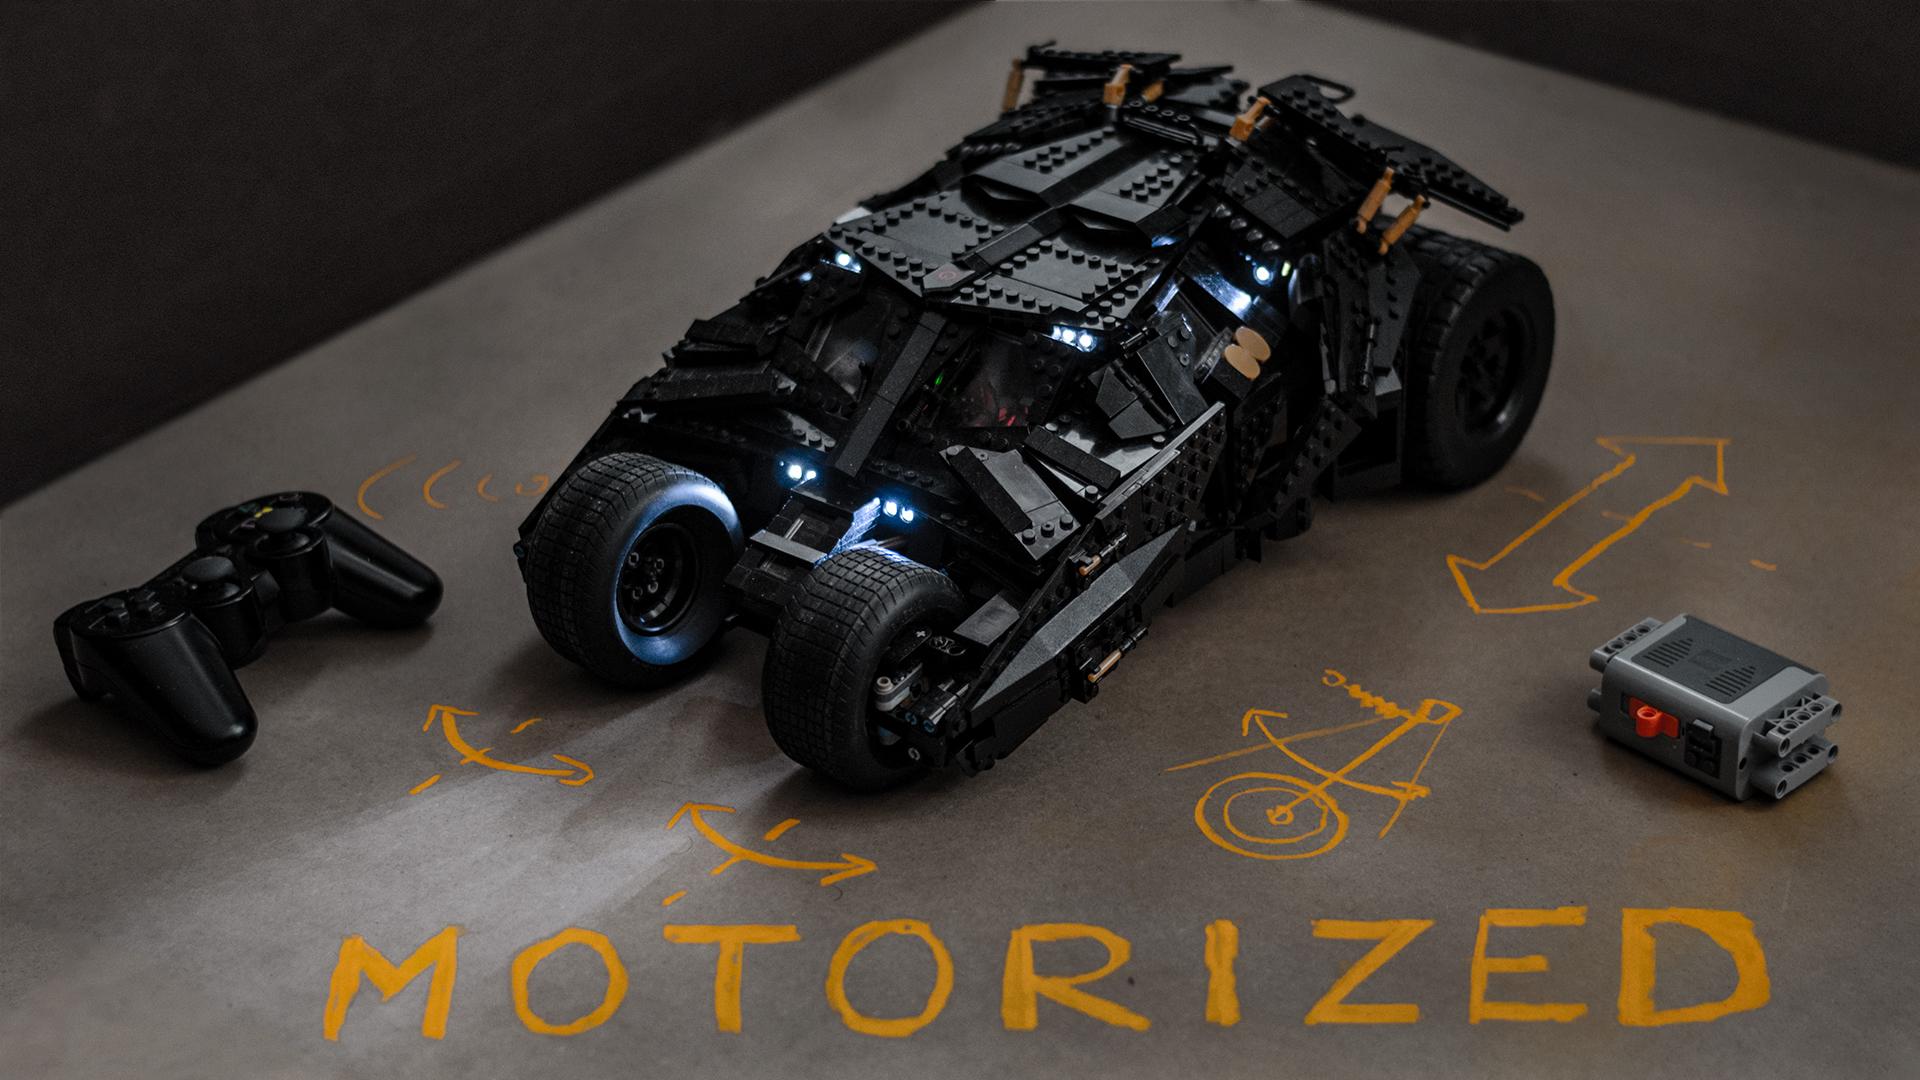 76023_lego_tumbler_motorized_power_functions